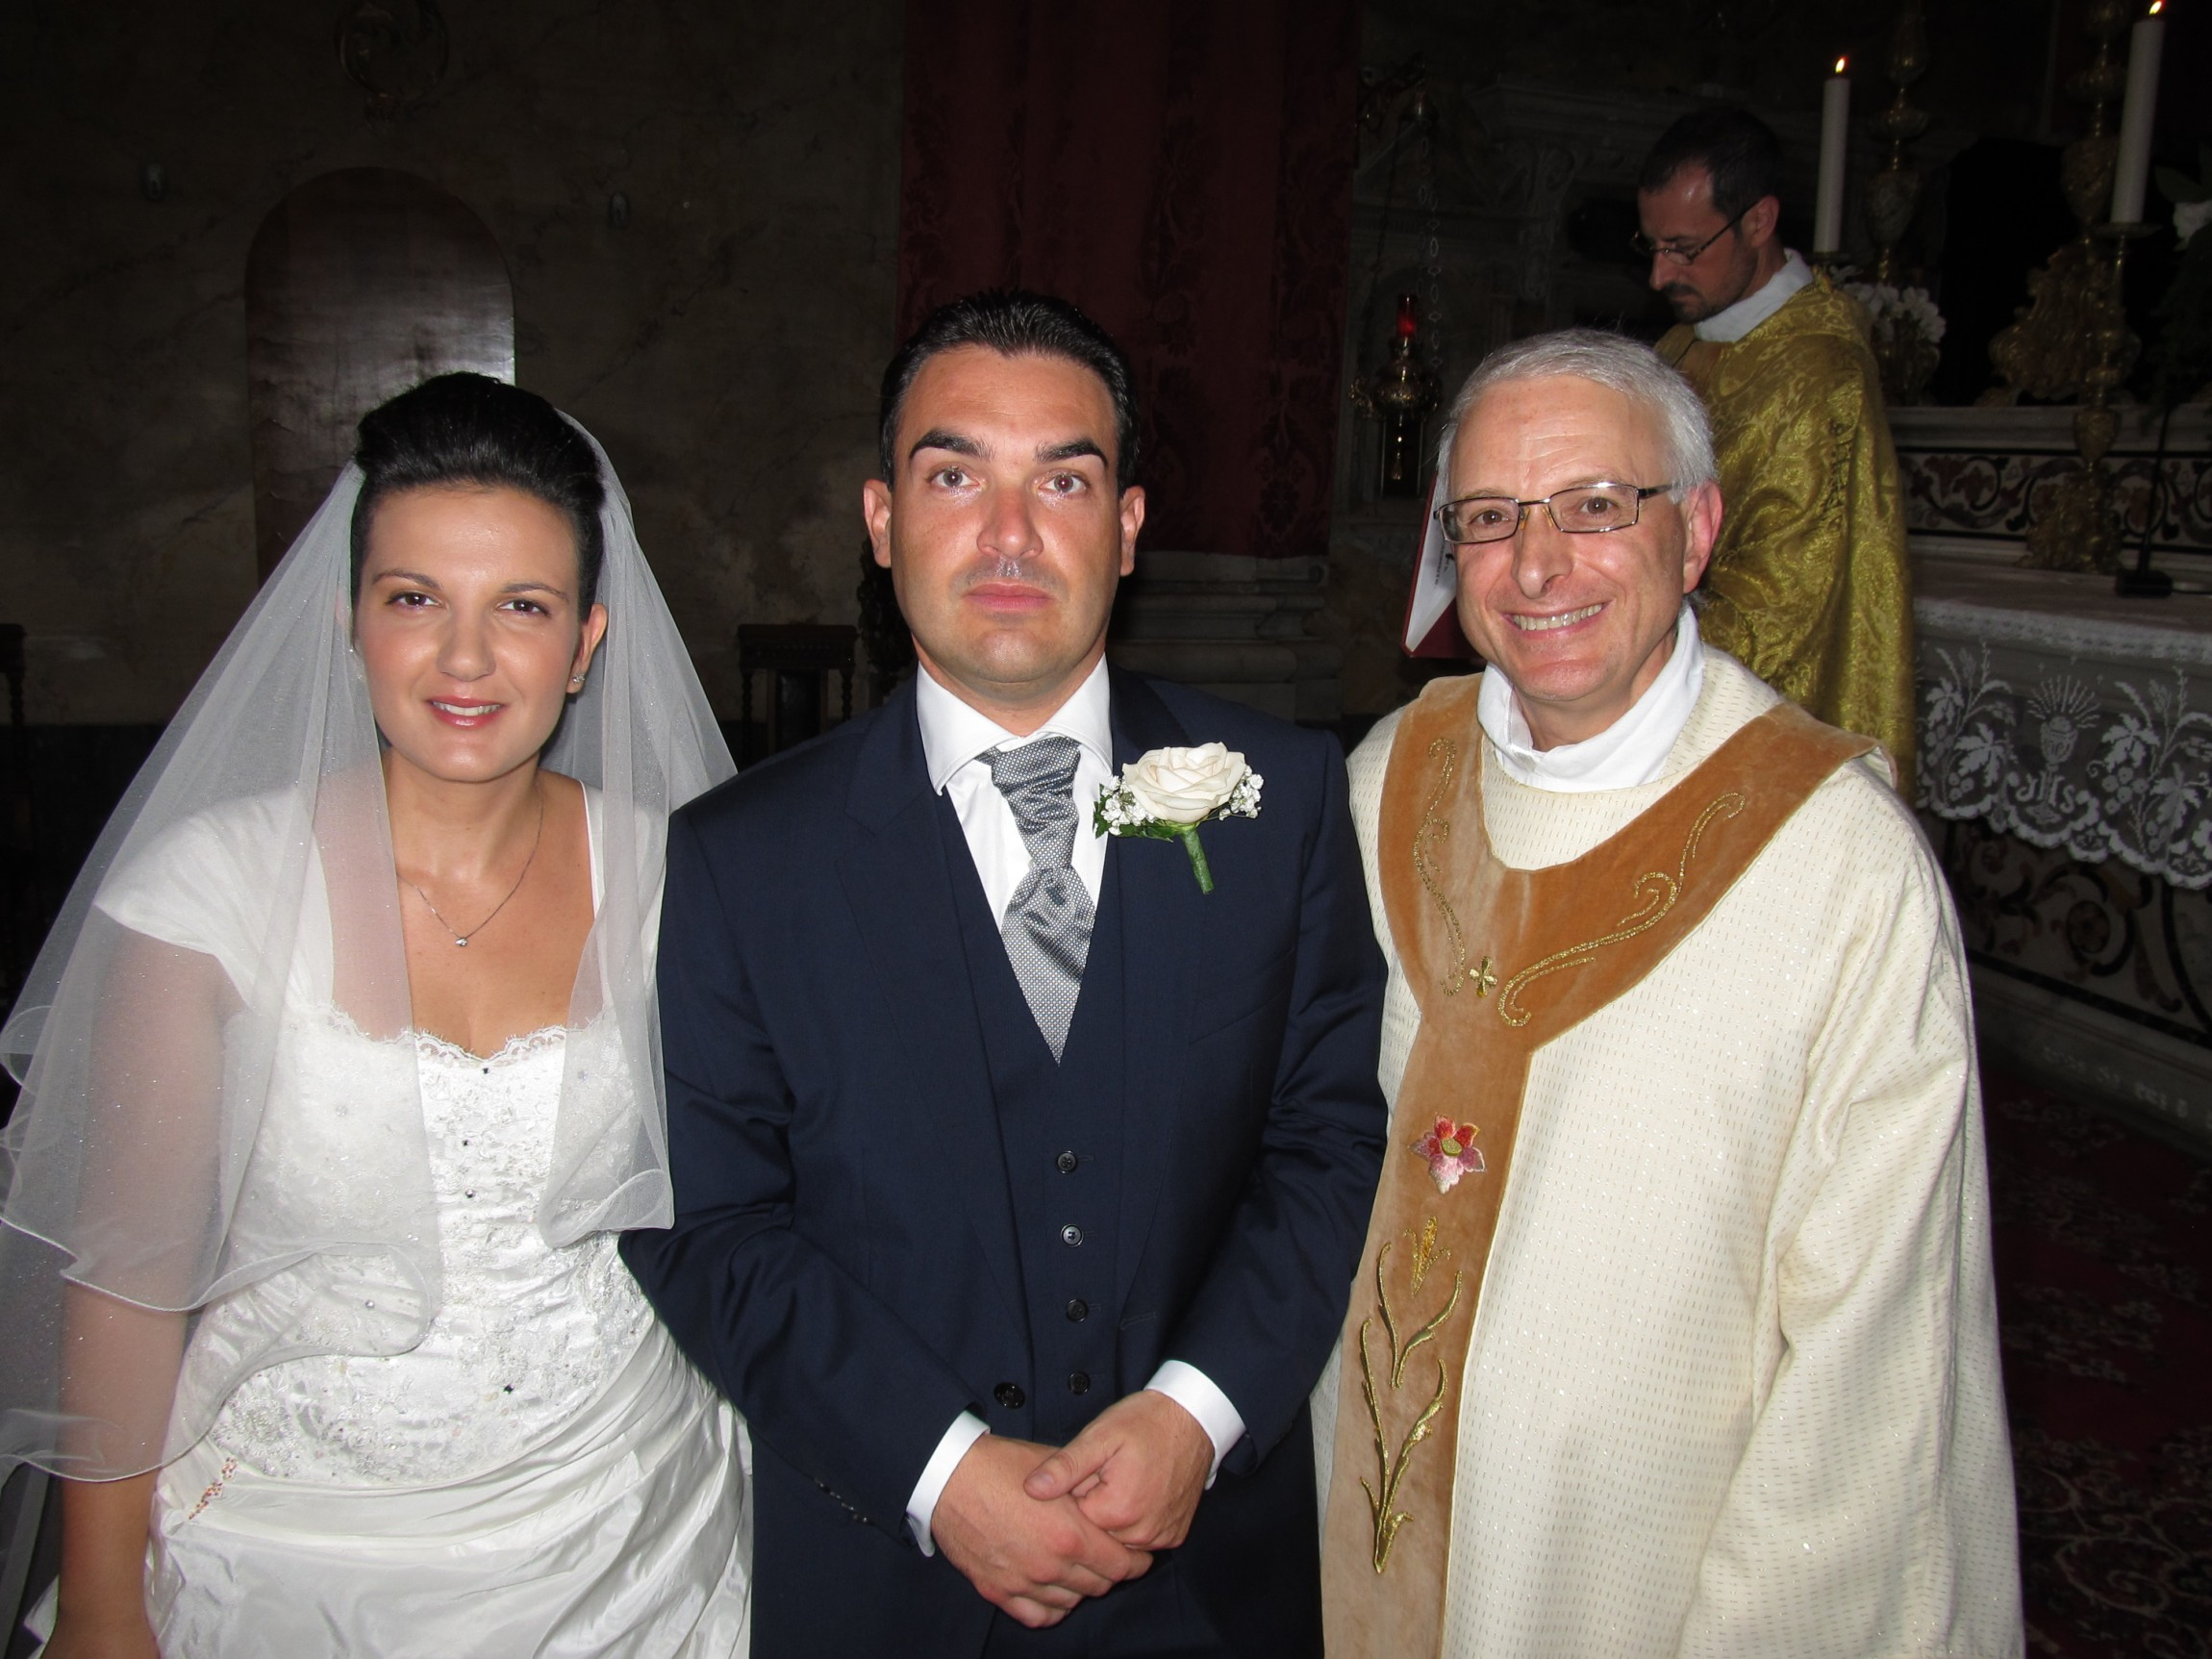 matrimonio_piccardo_franzi_2014-07-19-12-05-31